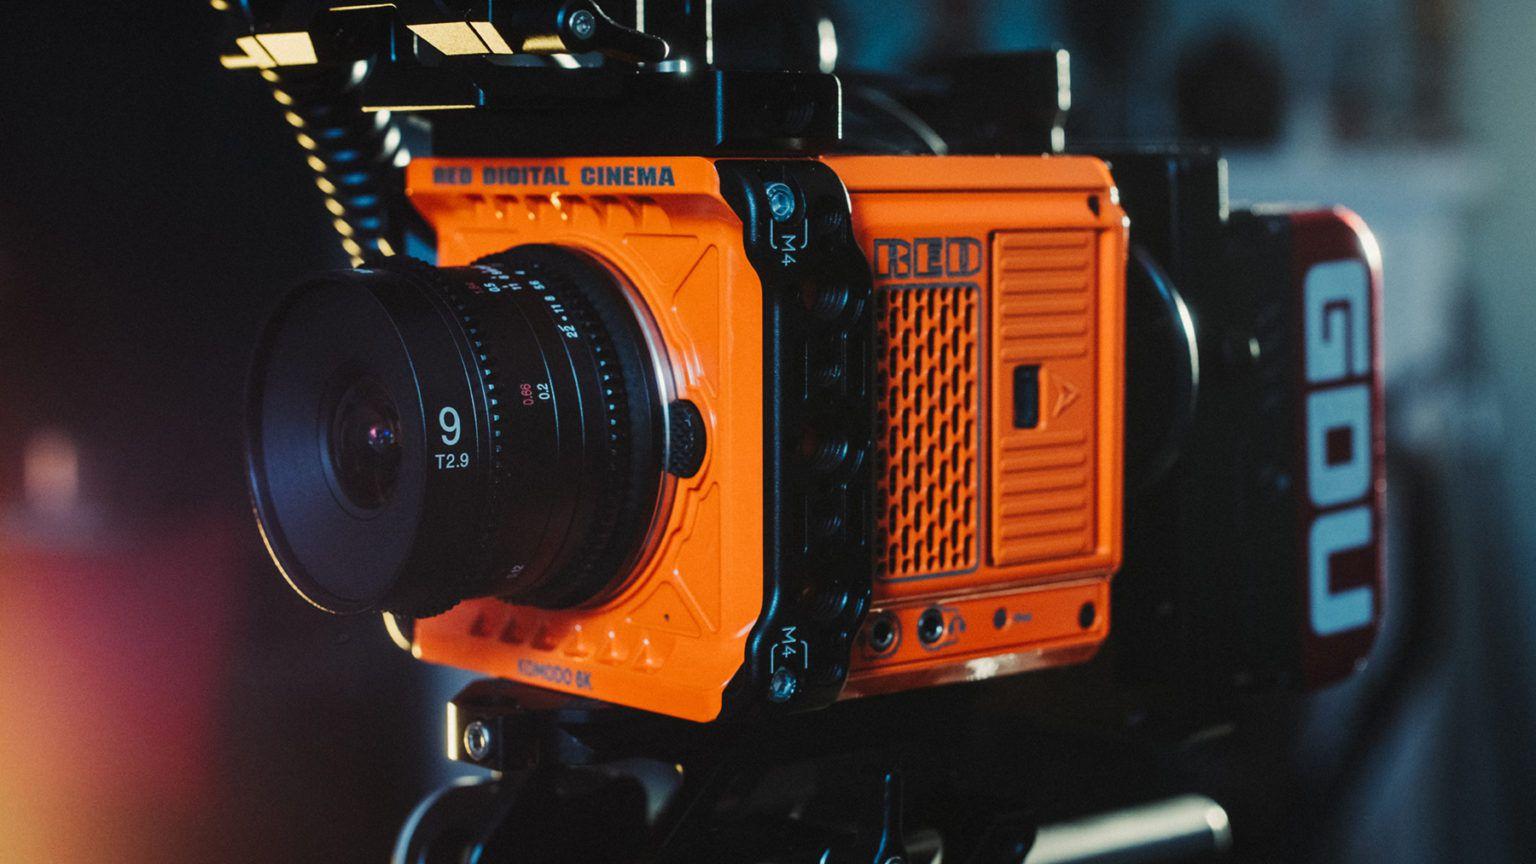 Кинокамера с объективом Laowa 9mm T2.9 Zero-D Cine